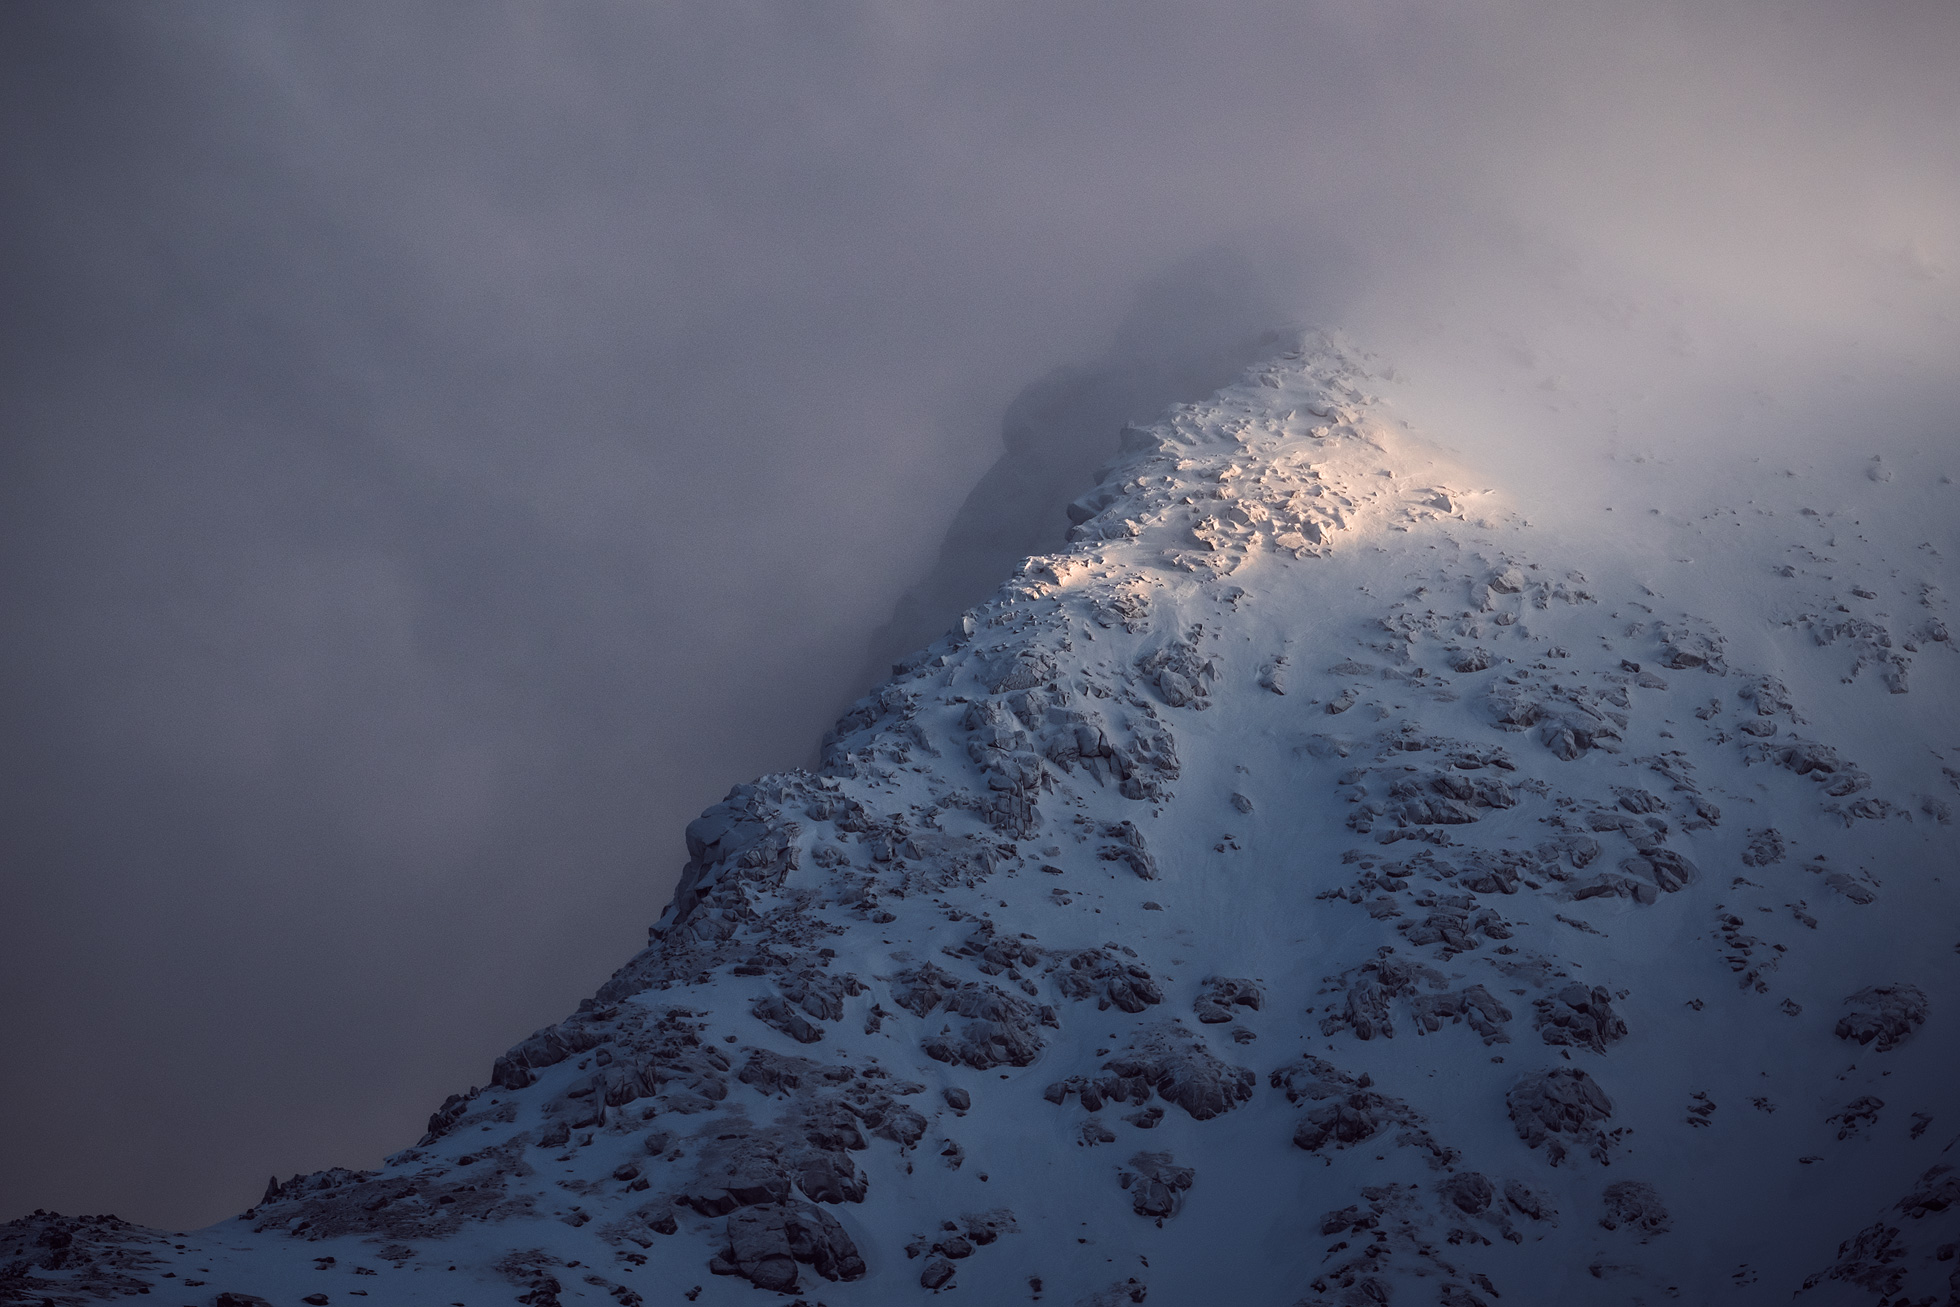 Lofoten-Mountain-Moody-2.jpg